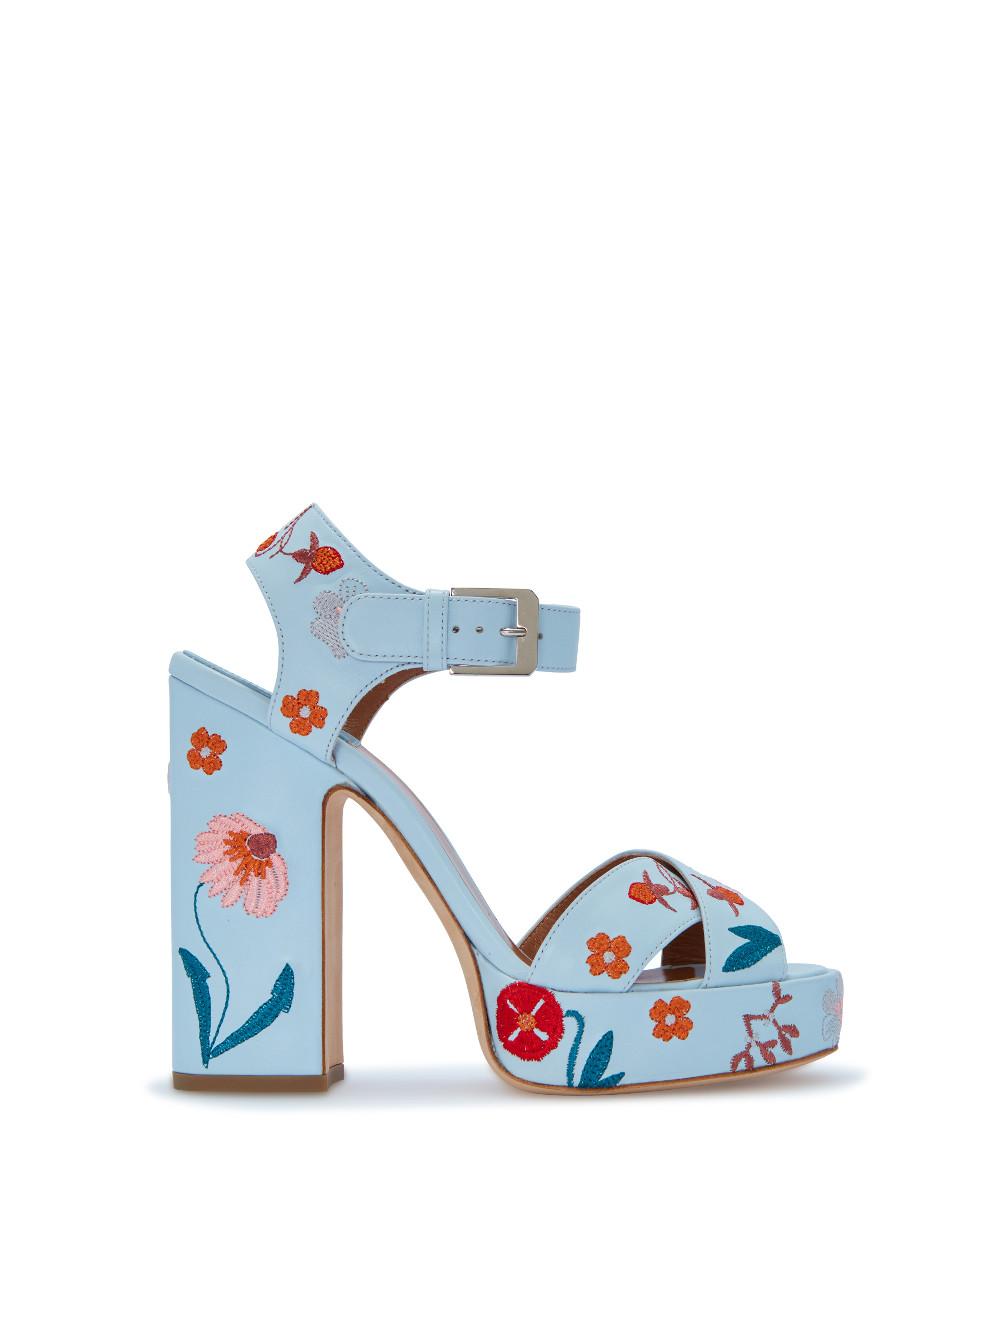 LD_PF18_Rosange_Sky Blue Embroidery_5018.jpg